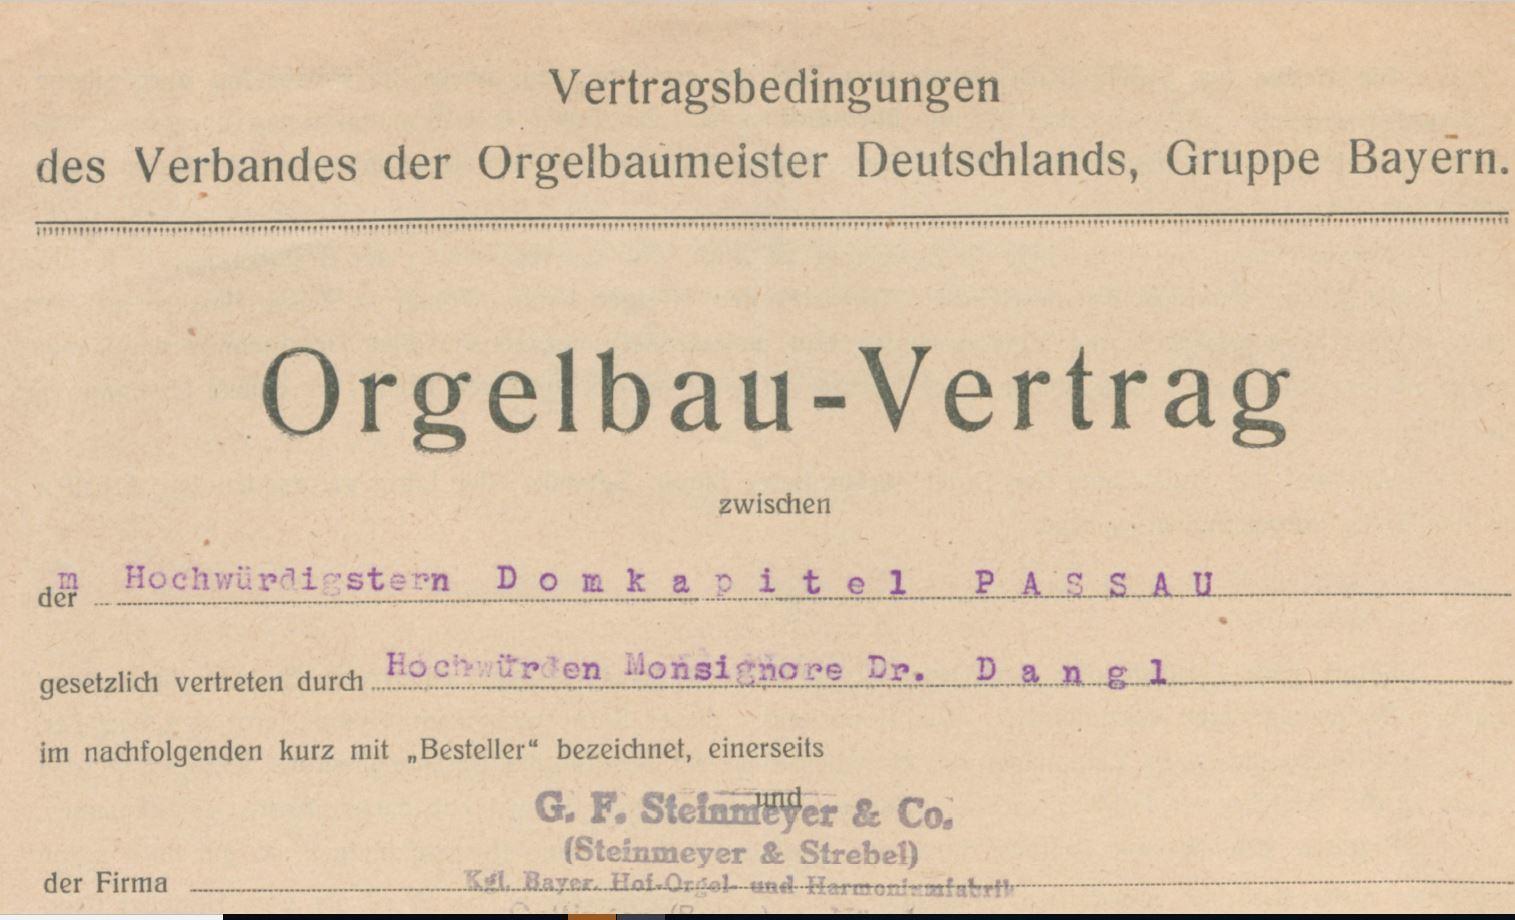 Orgelbauvertrag